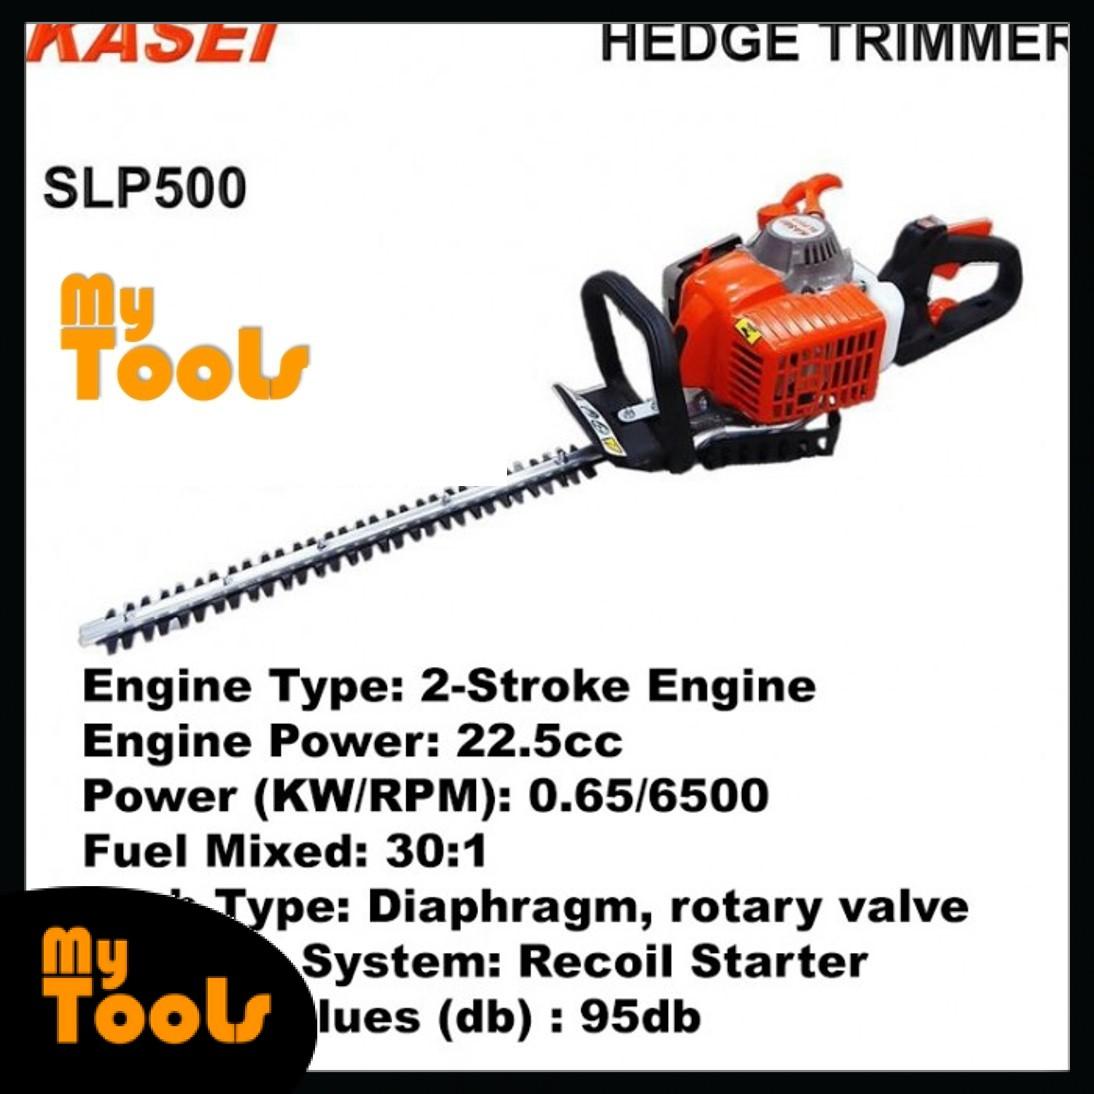 Kasei Hedge Trimmer SLP500 500mm